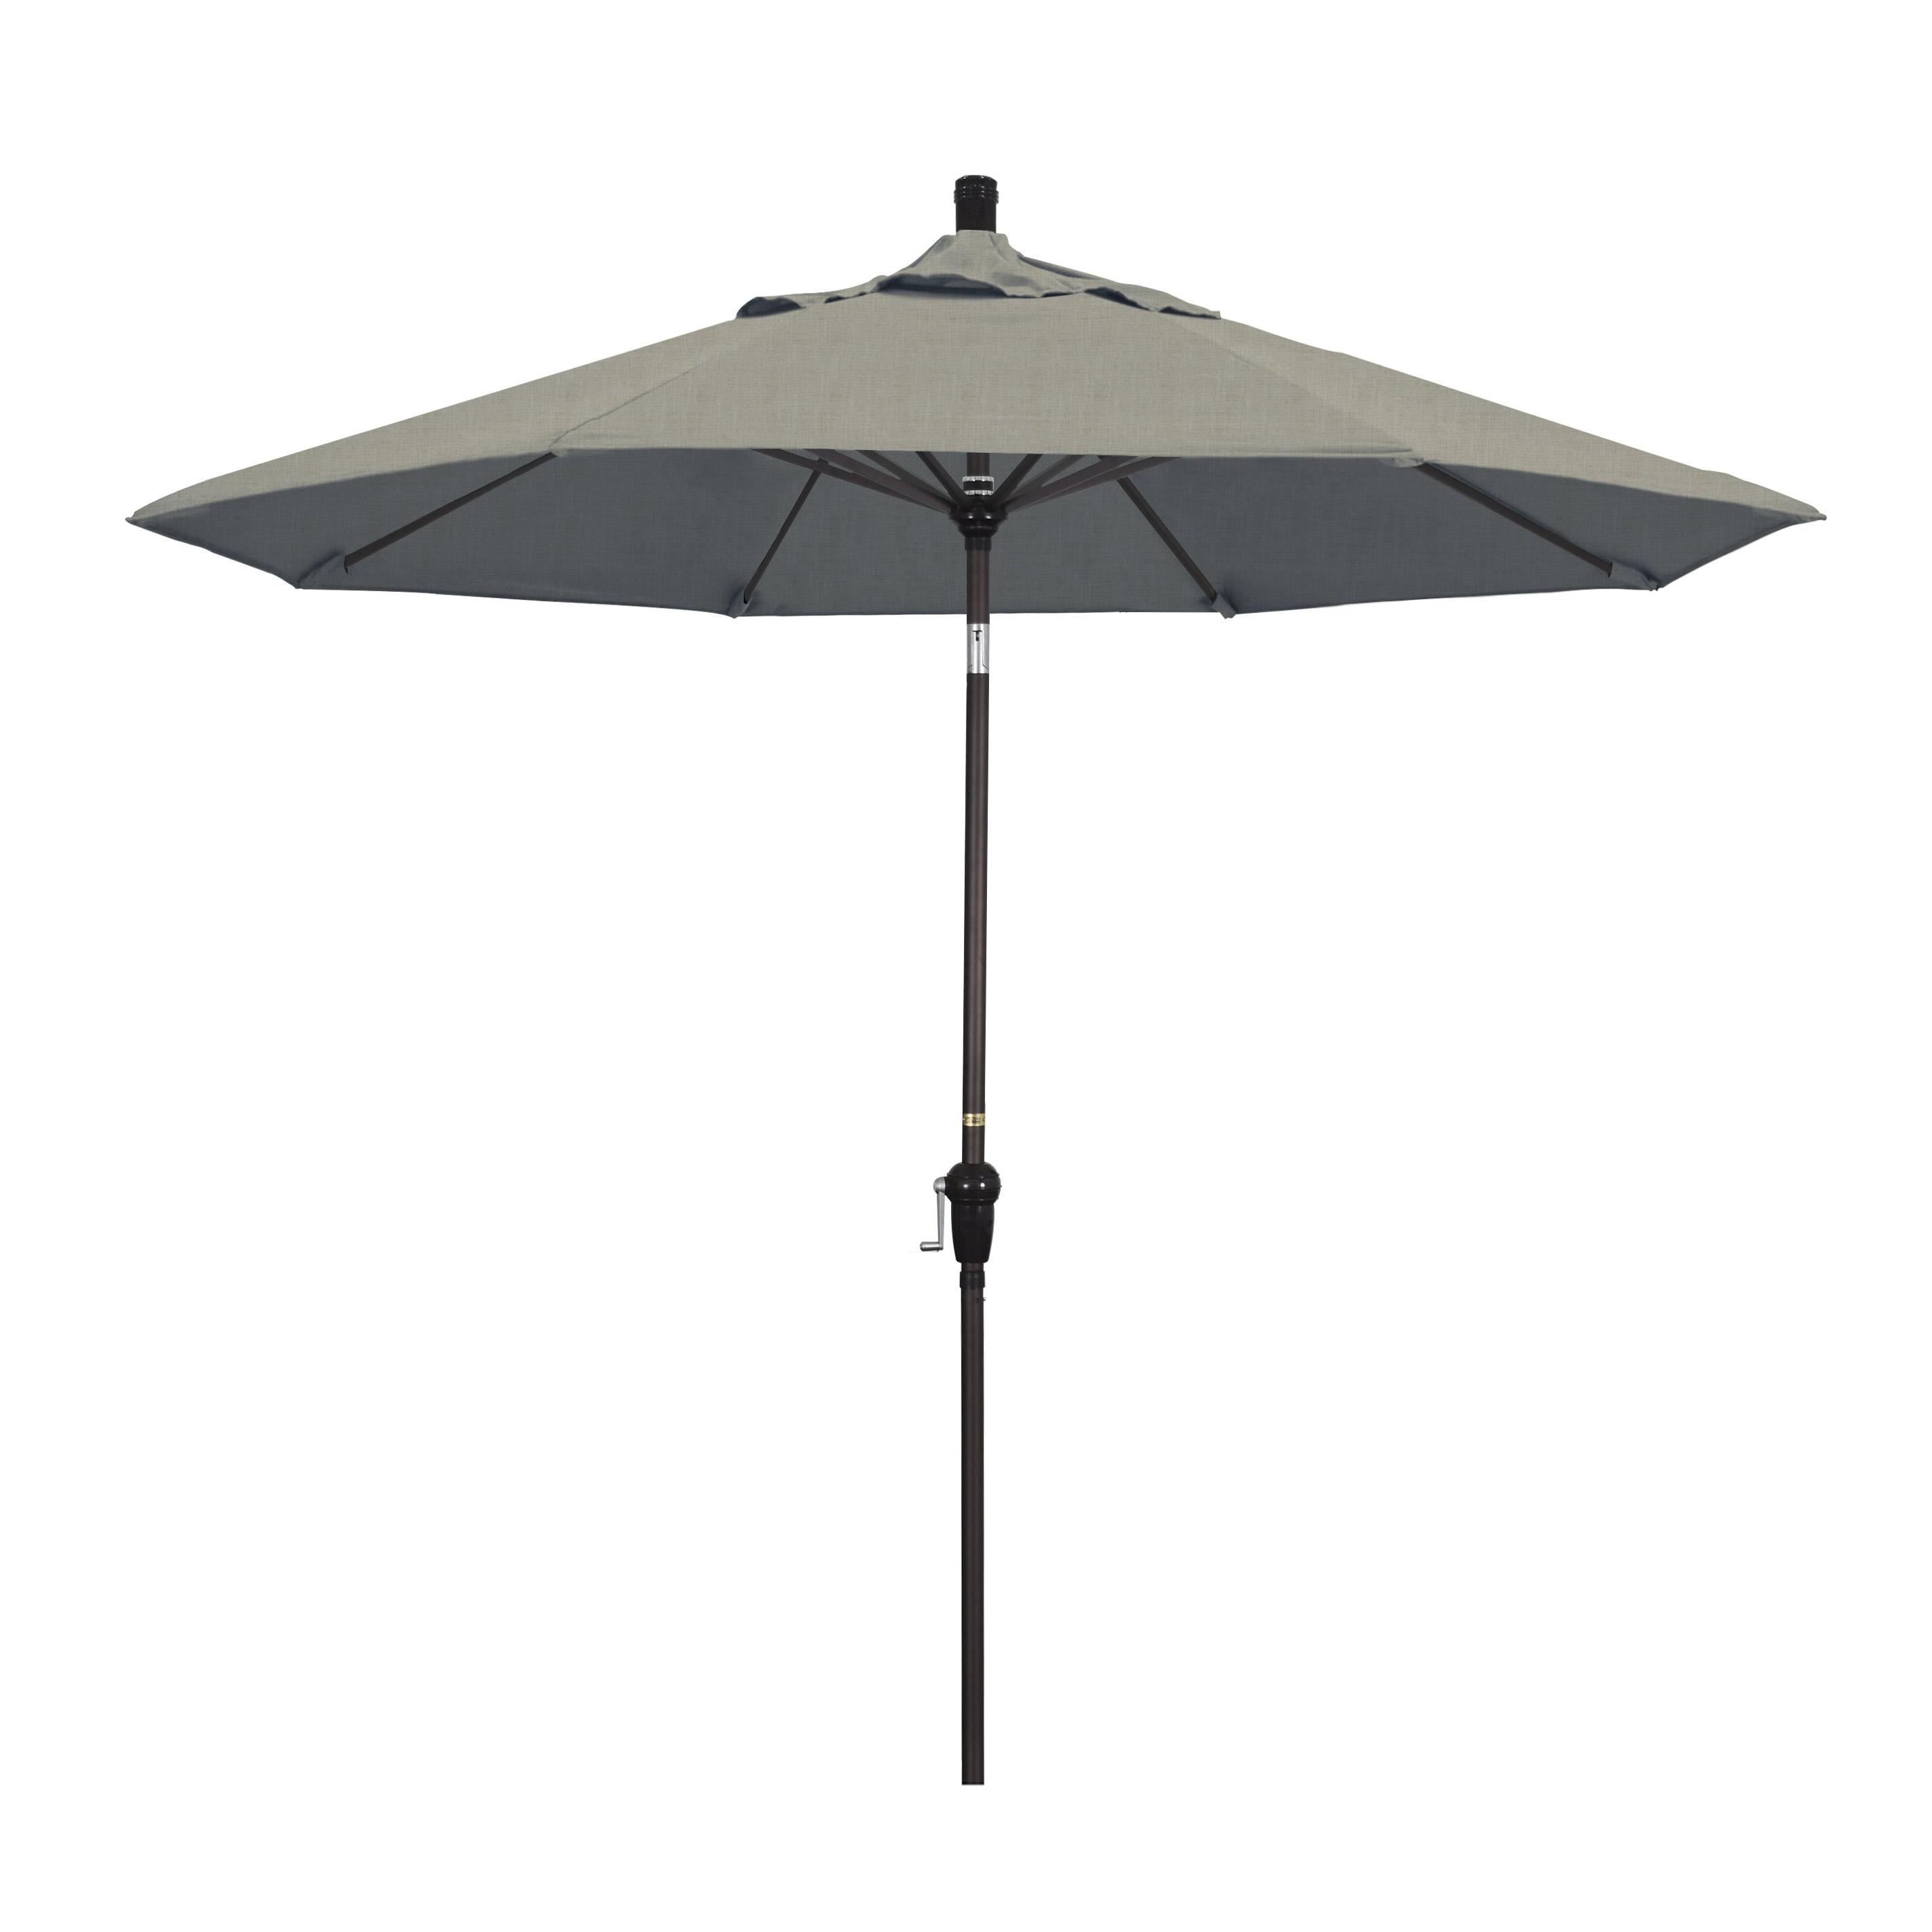 2019 Mullaney Market Sunbrella Umbrellas Pertaining To Mullaney 9' Market Sunbrella Umbrella (View 2 of 20)